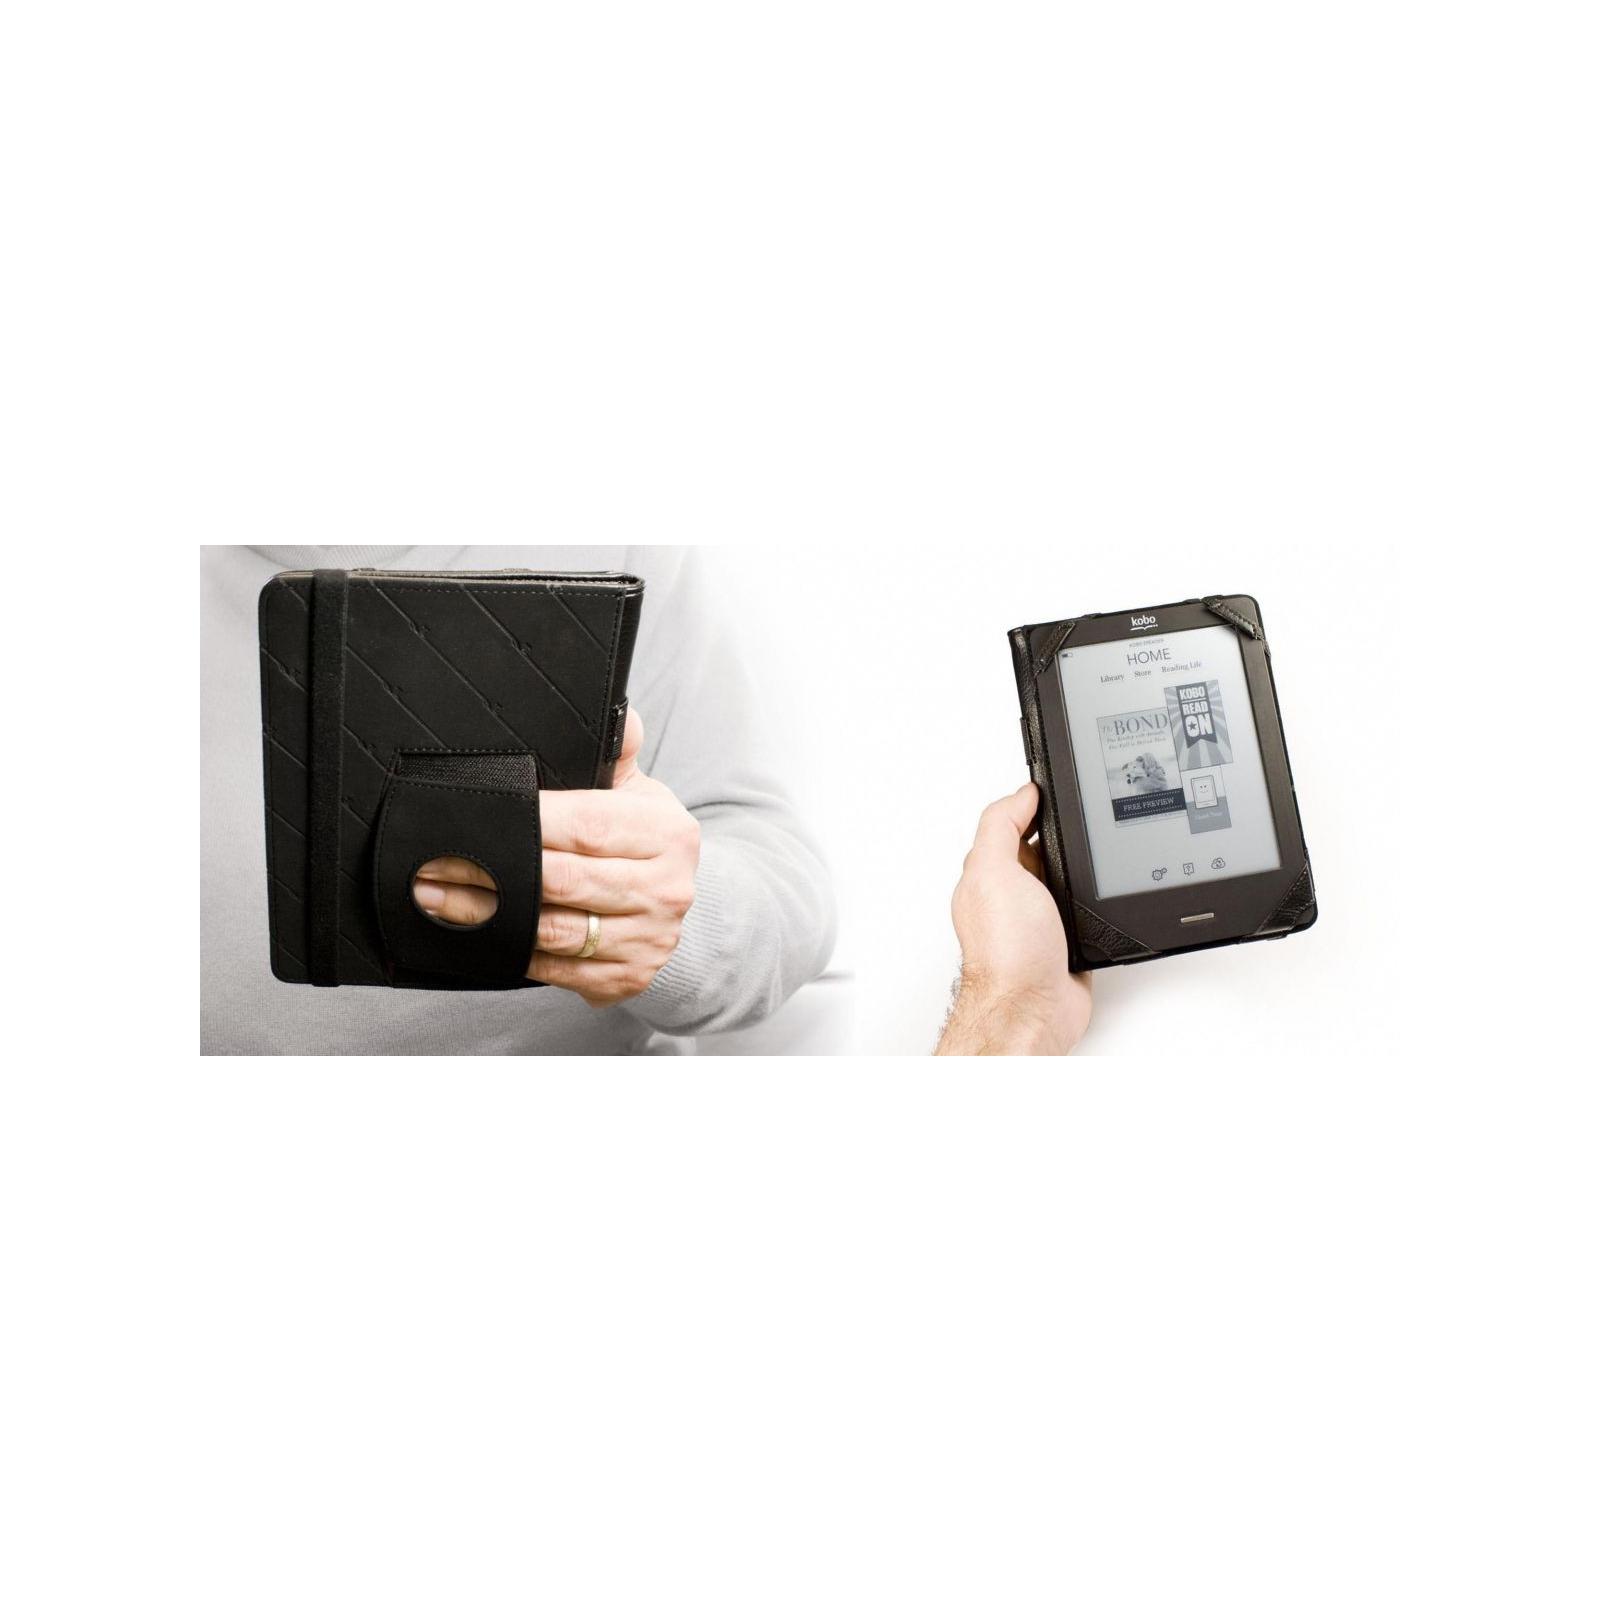 Чехол для электронной книги Tuff-Luv 6 Embrace faux leather/Black (C4_55) изображение 5